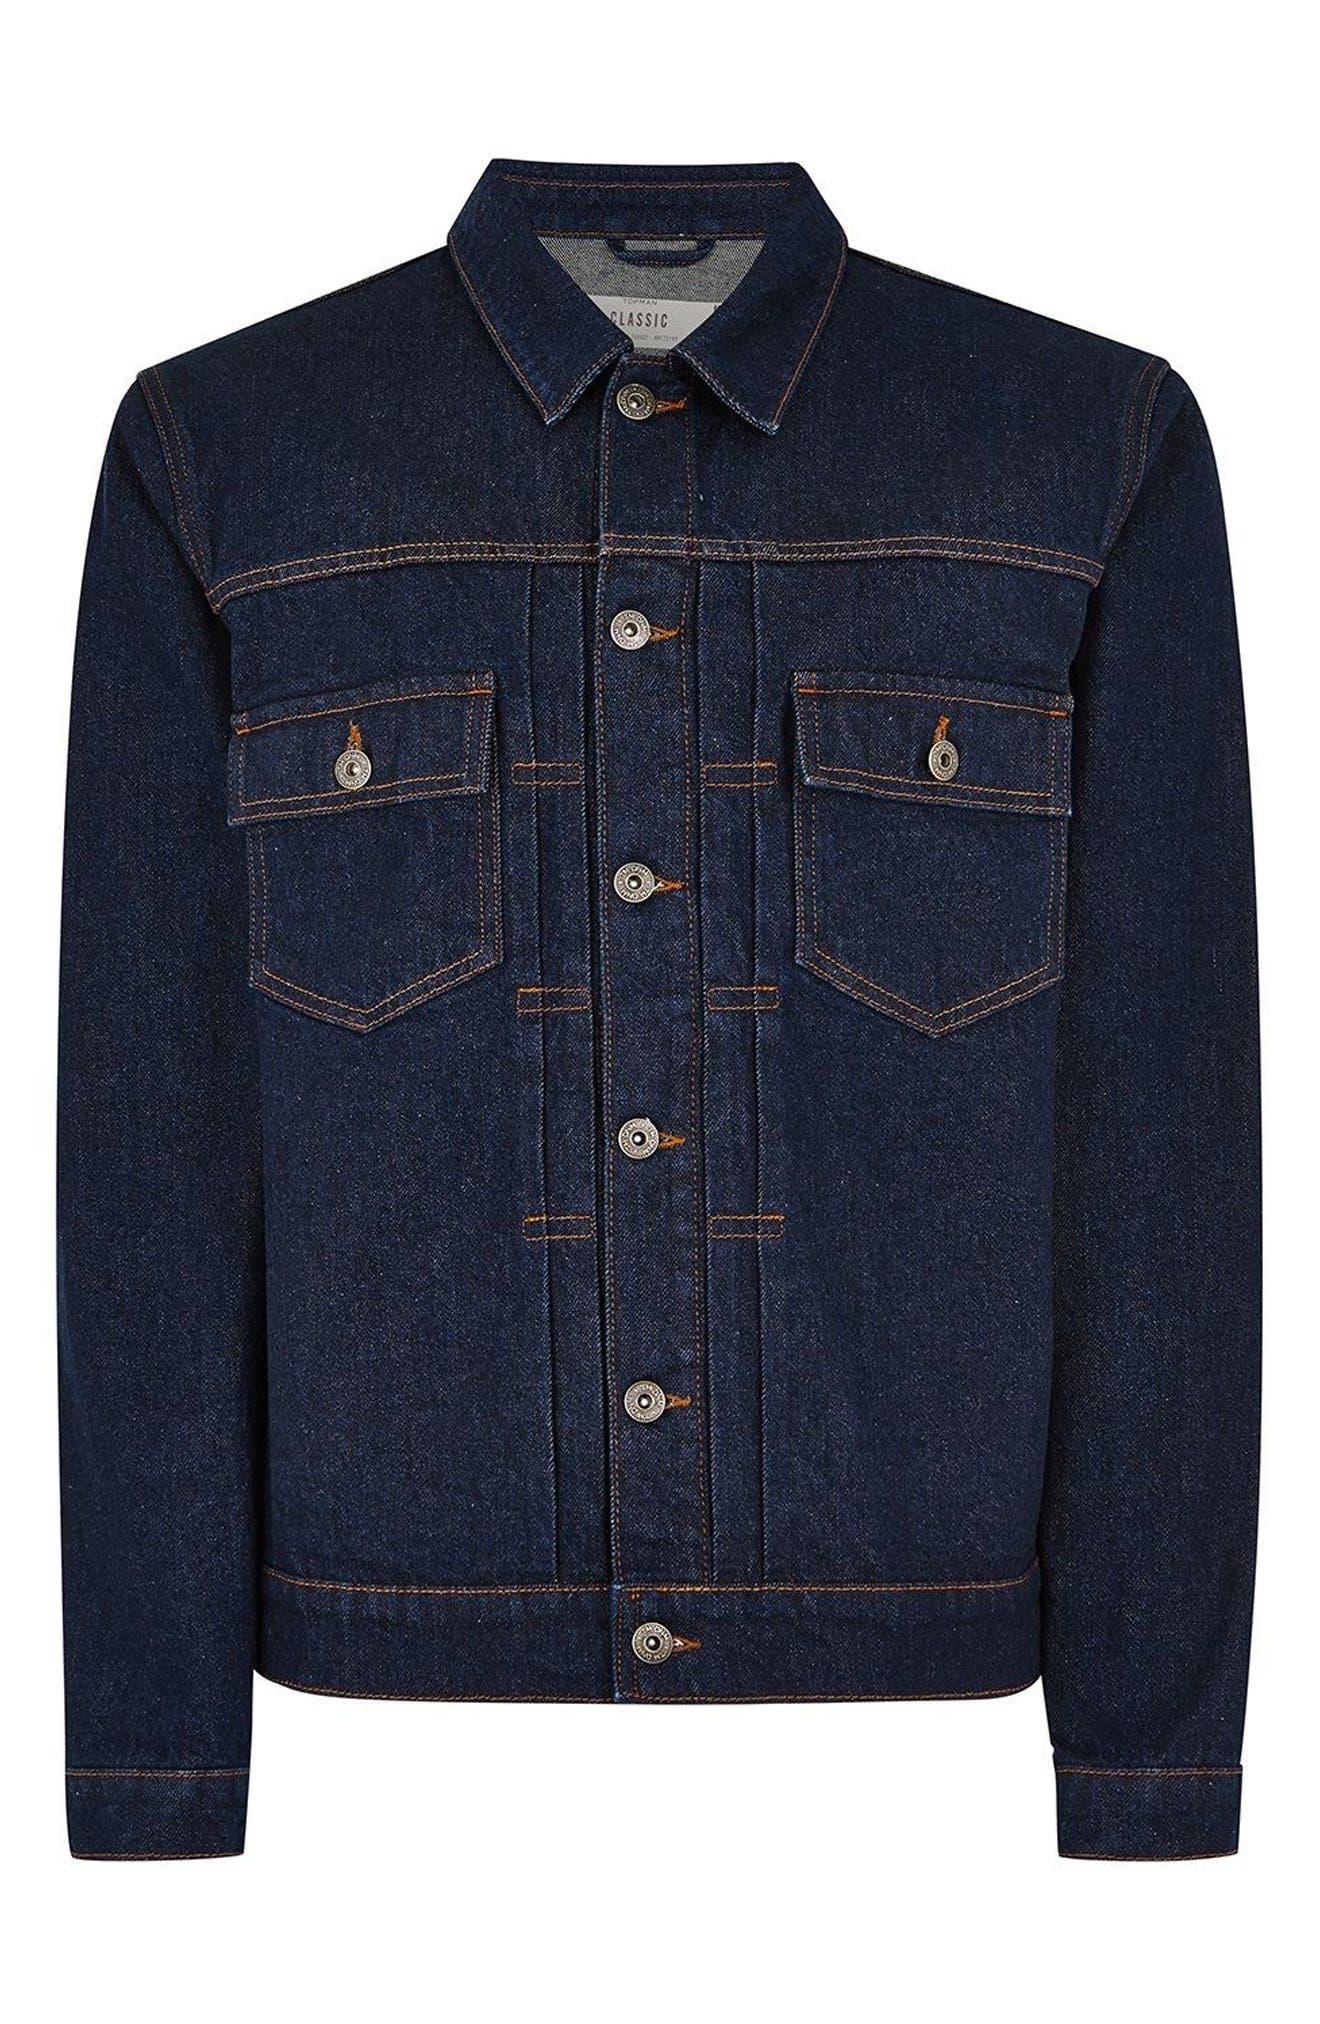 Raw Denim Jacket,                             Alternate thumbnail 6, color,                             DARK BLUE